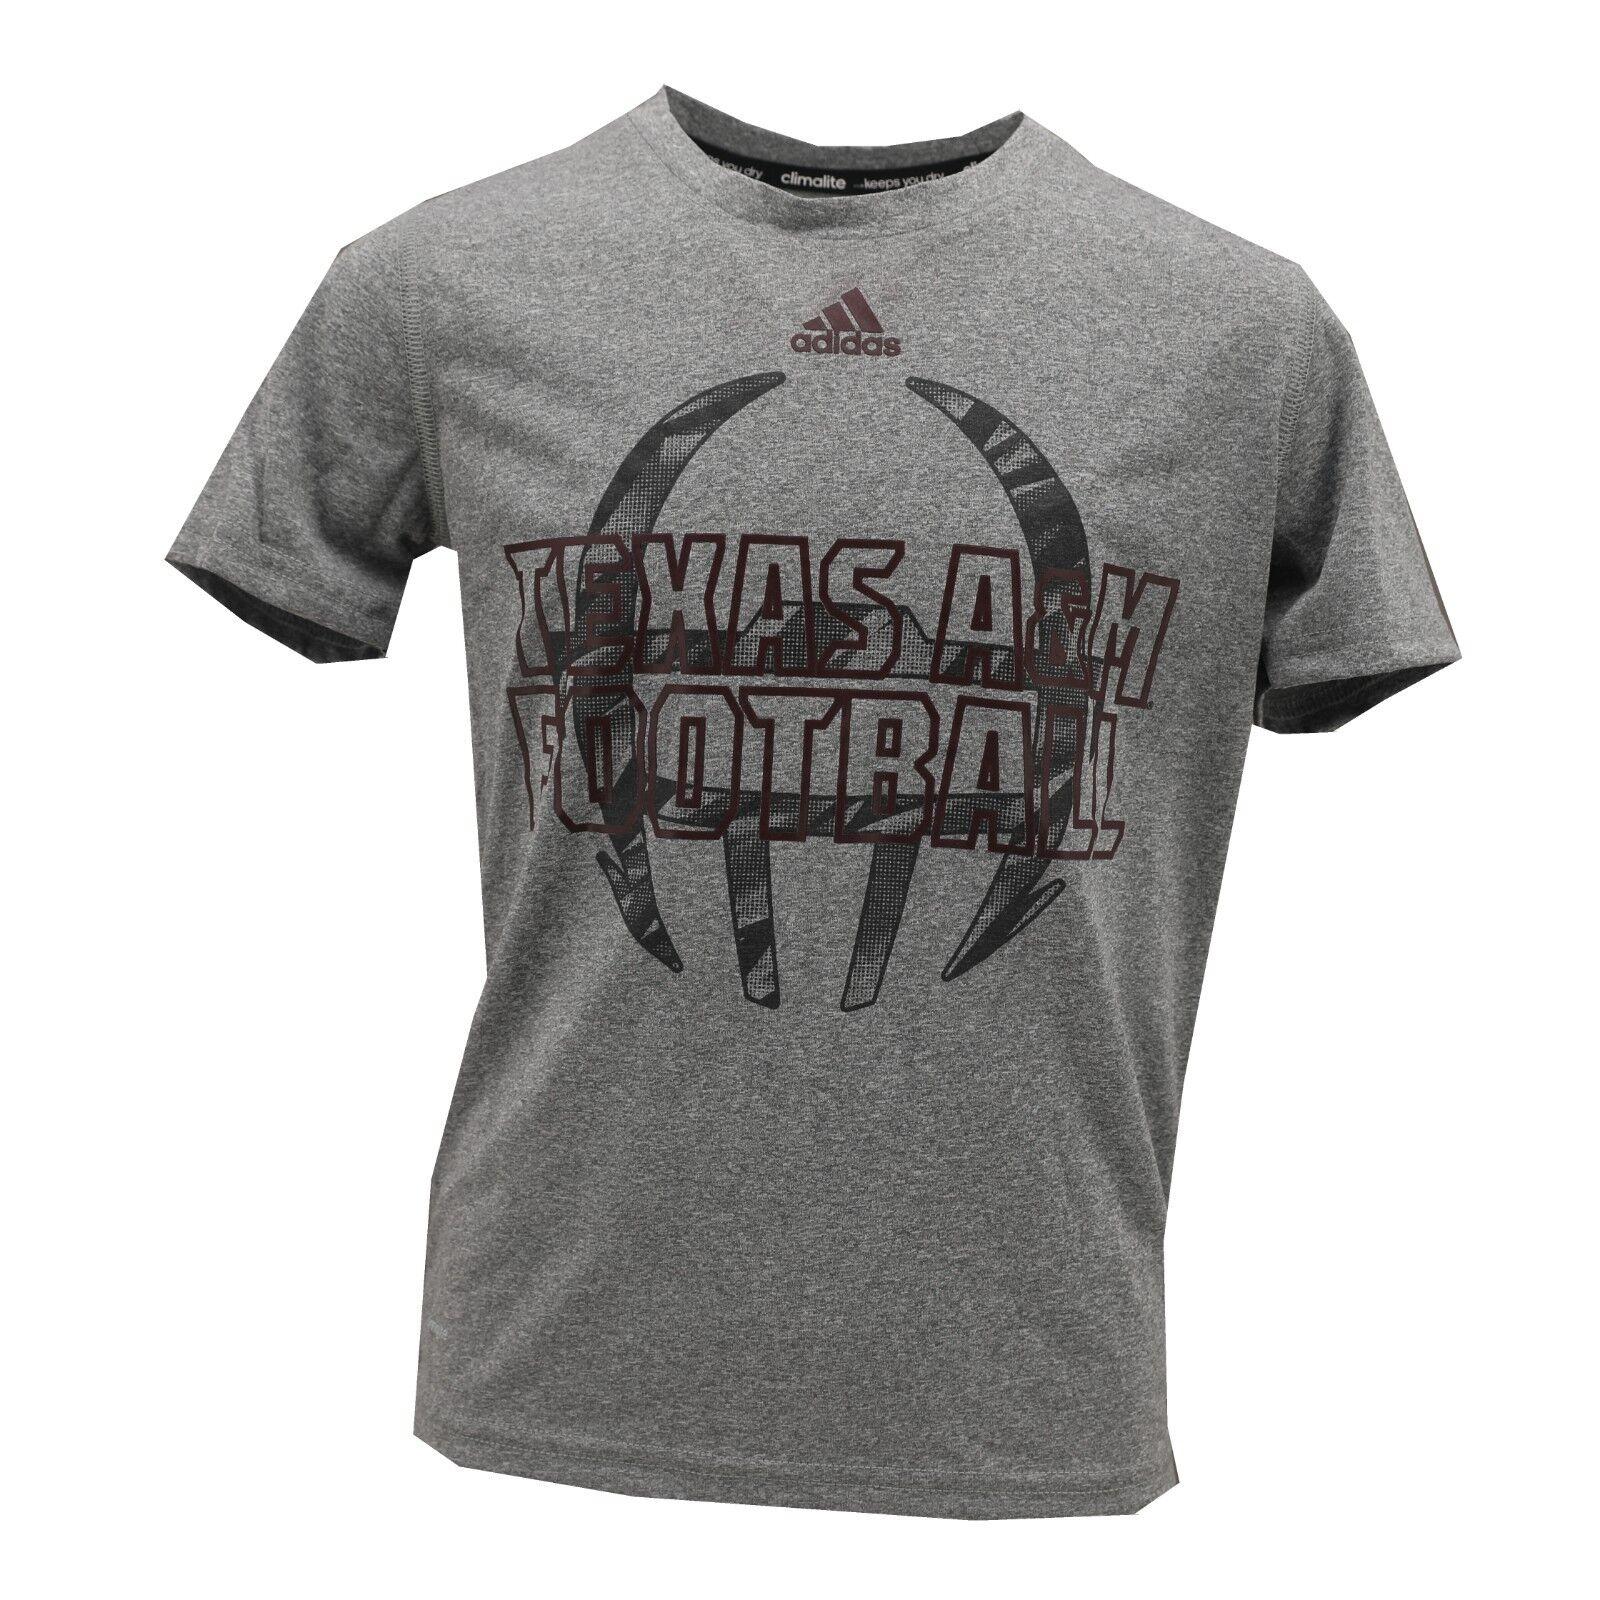 a&m adidas shirt